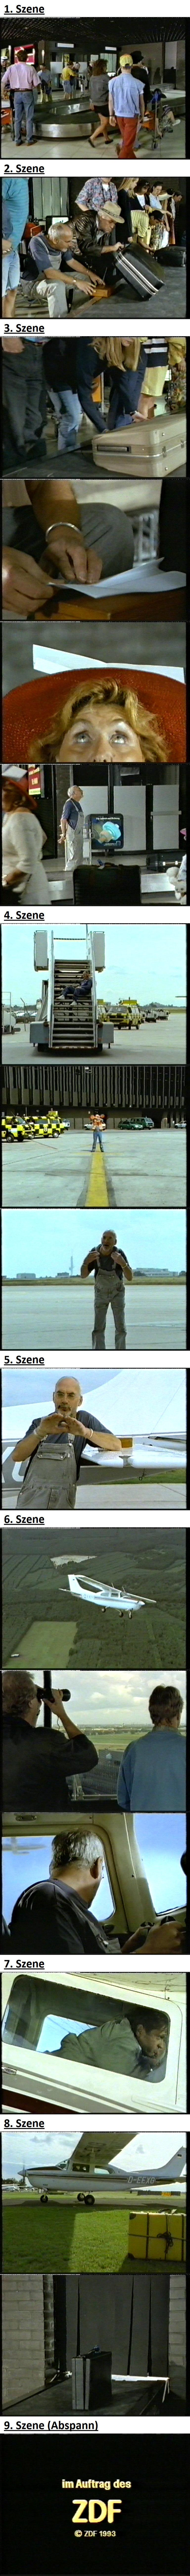 schnittbericht-hoehenflug